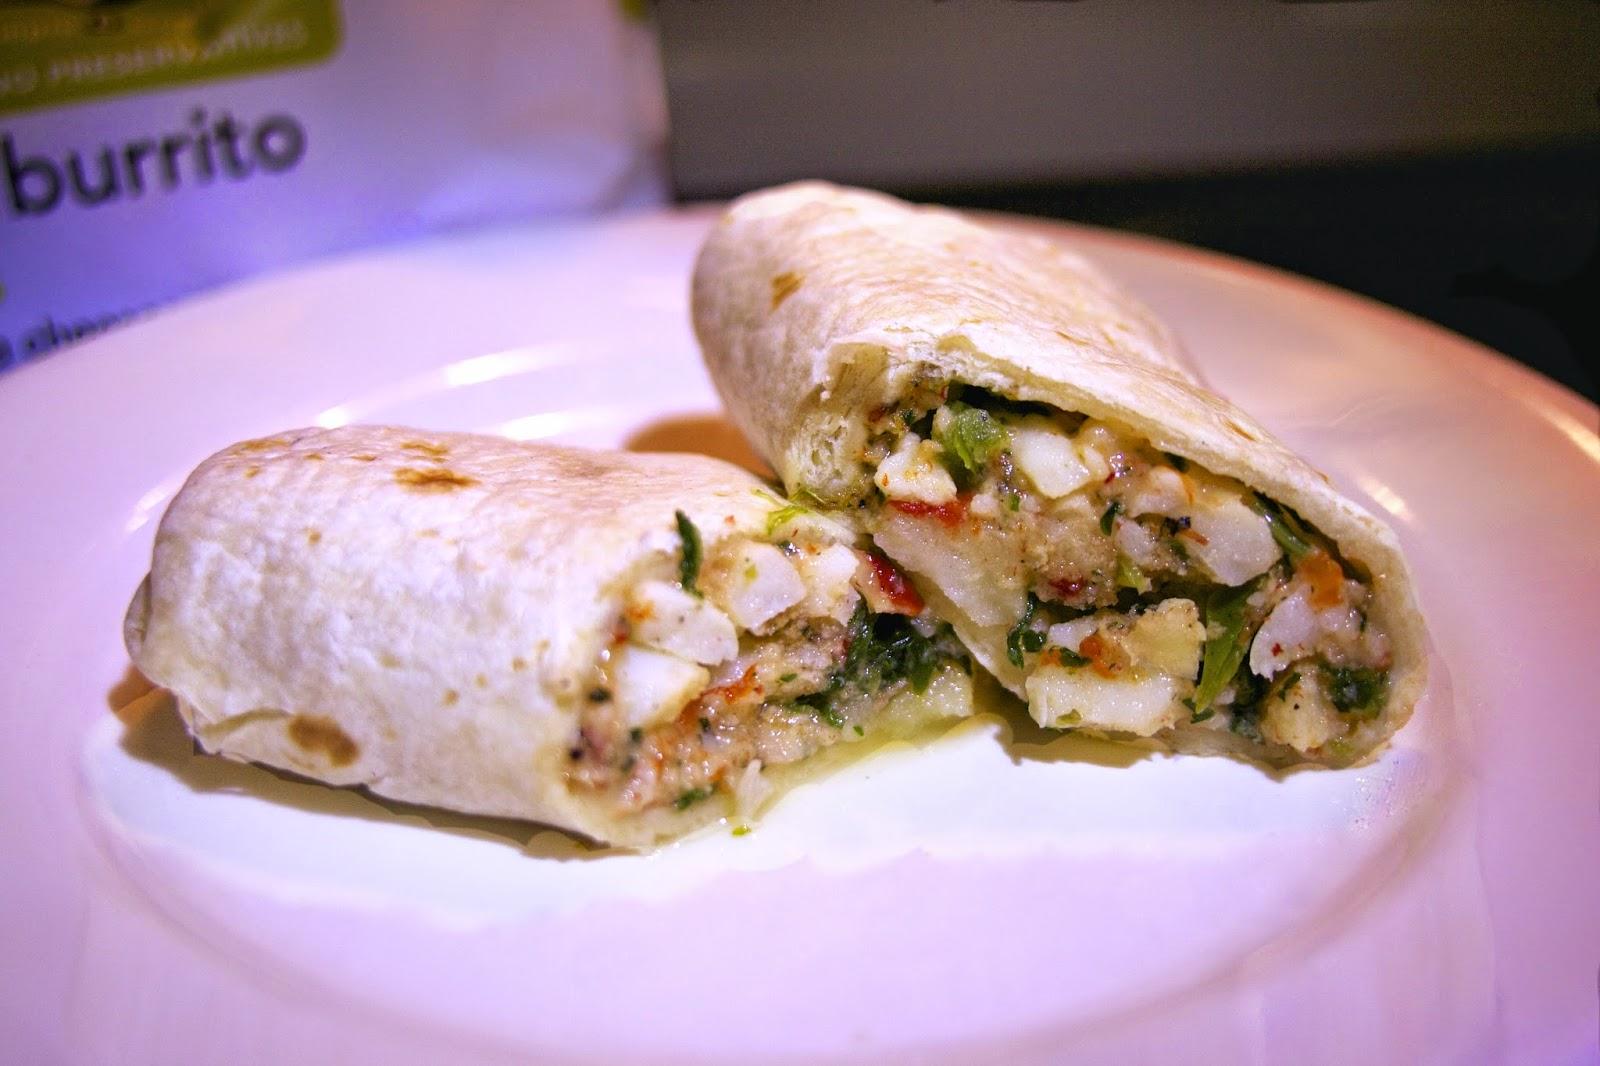 Breakfast Burrito: simplelivingeating.com